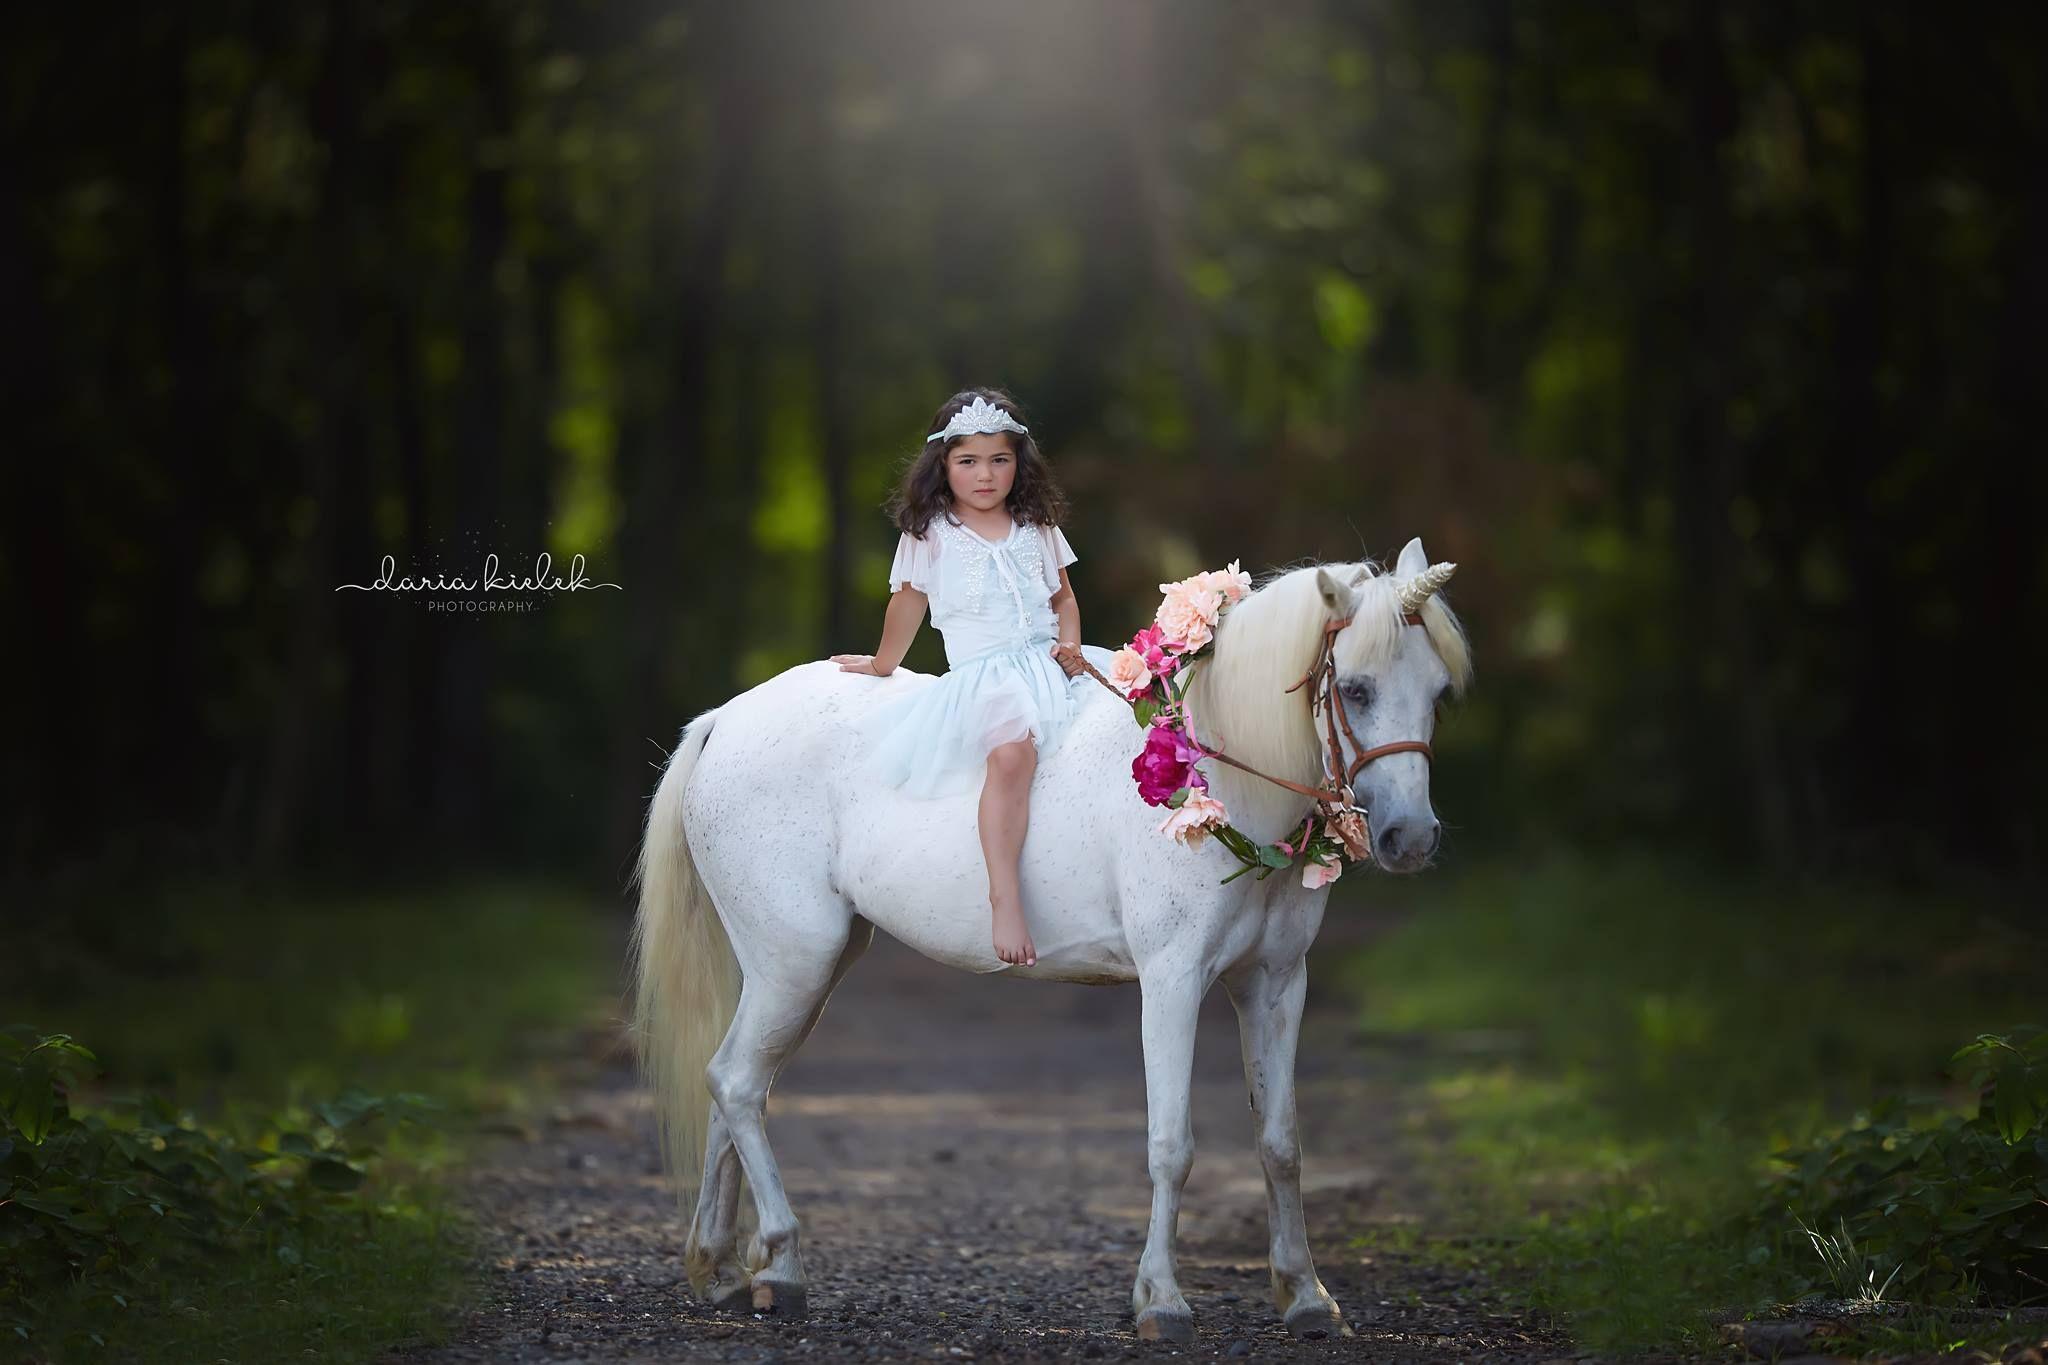 A princess and her unicorn tutu du monde tutu dress and